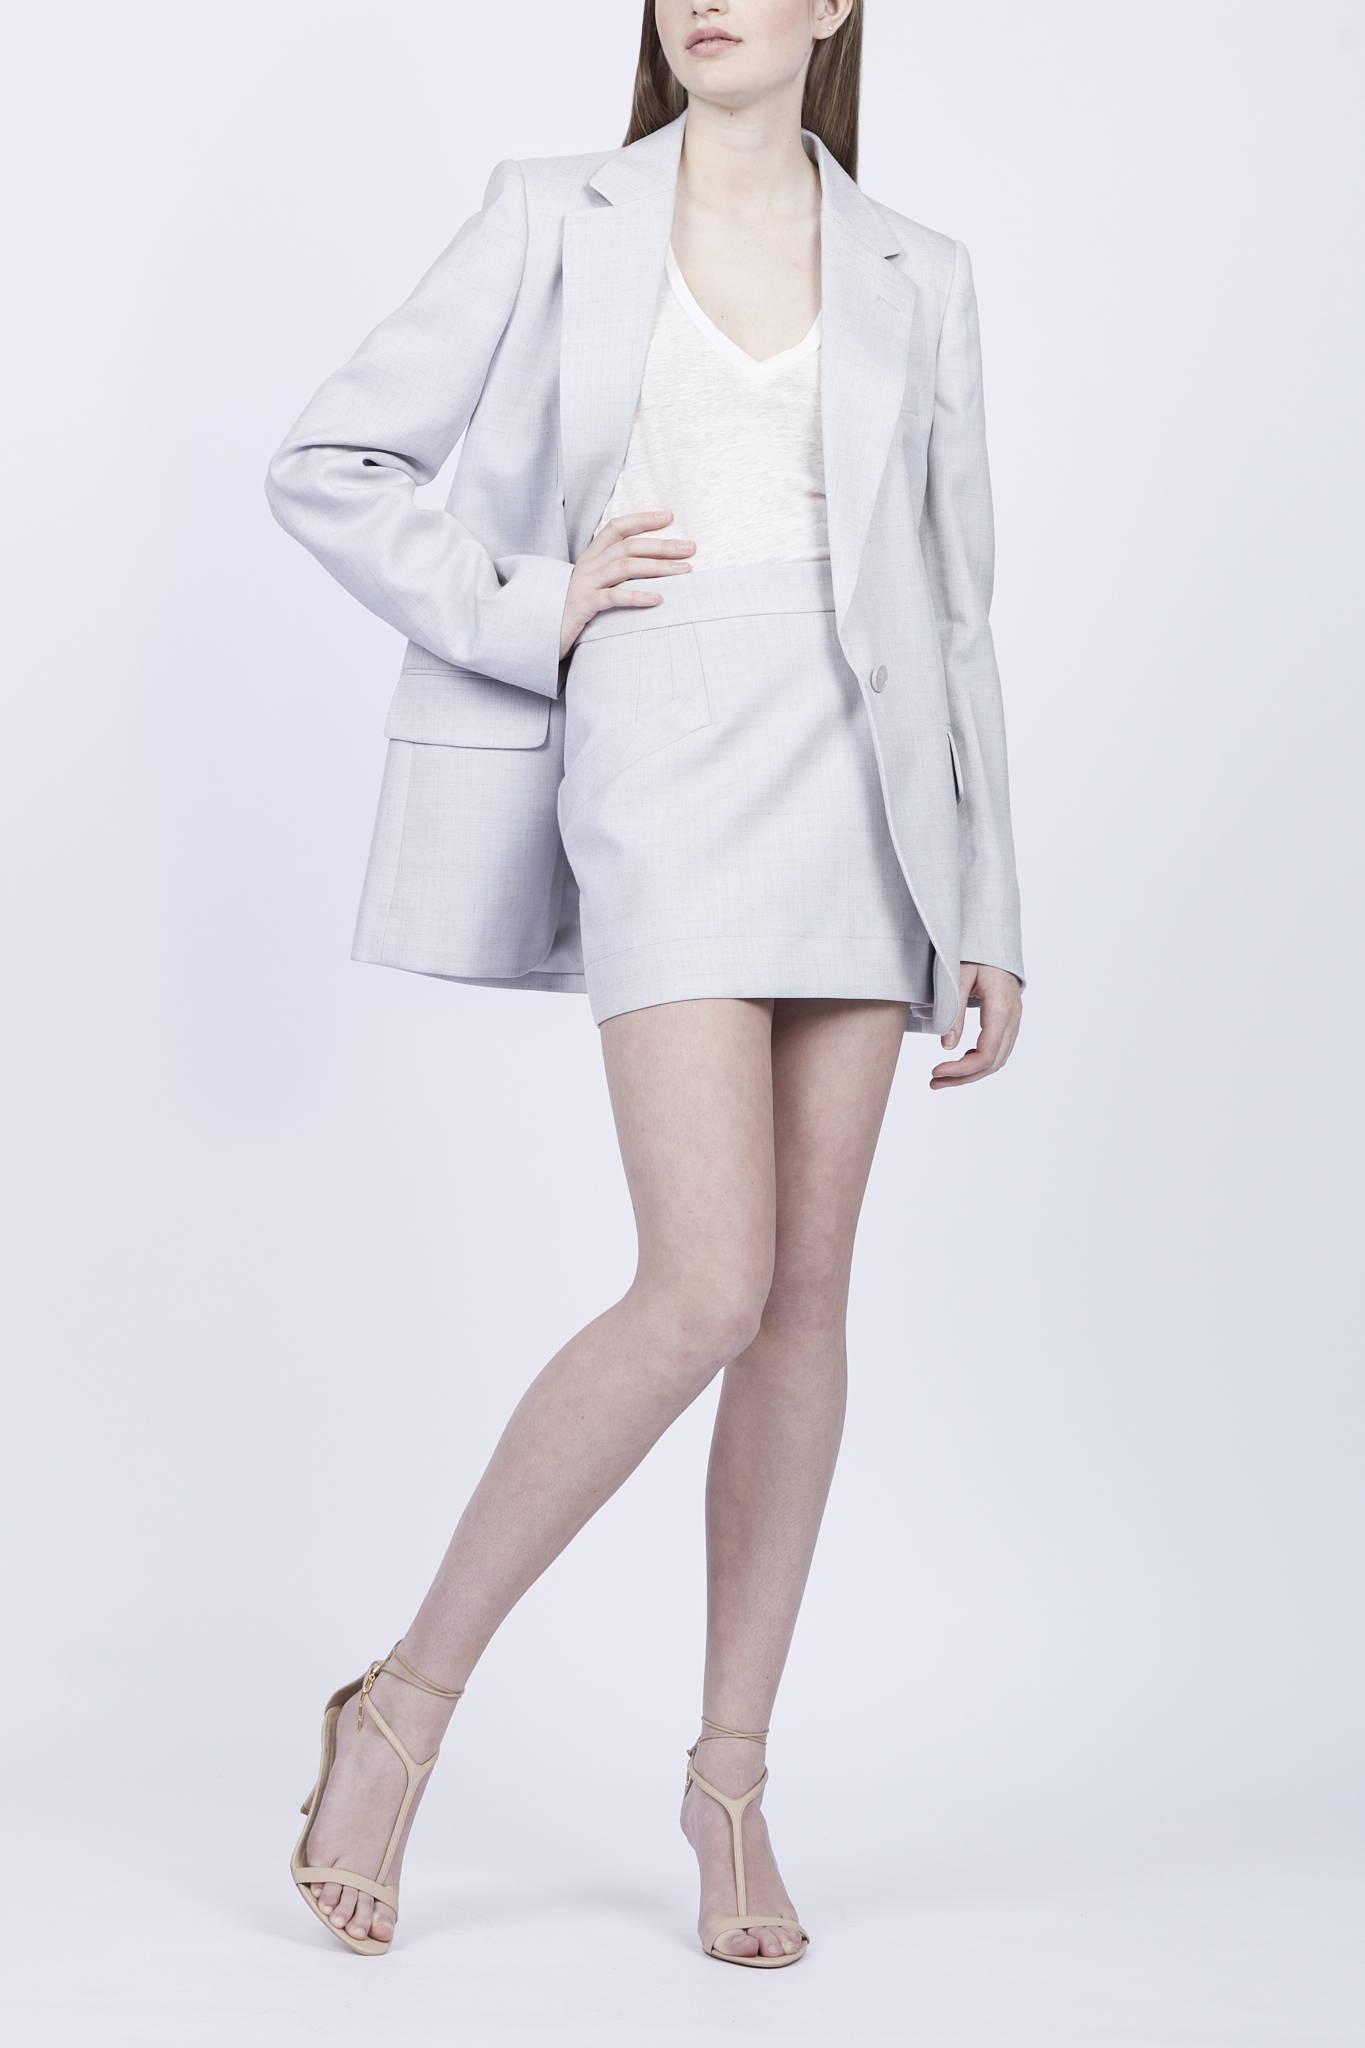 Stella MCartney Linen Skirt